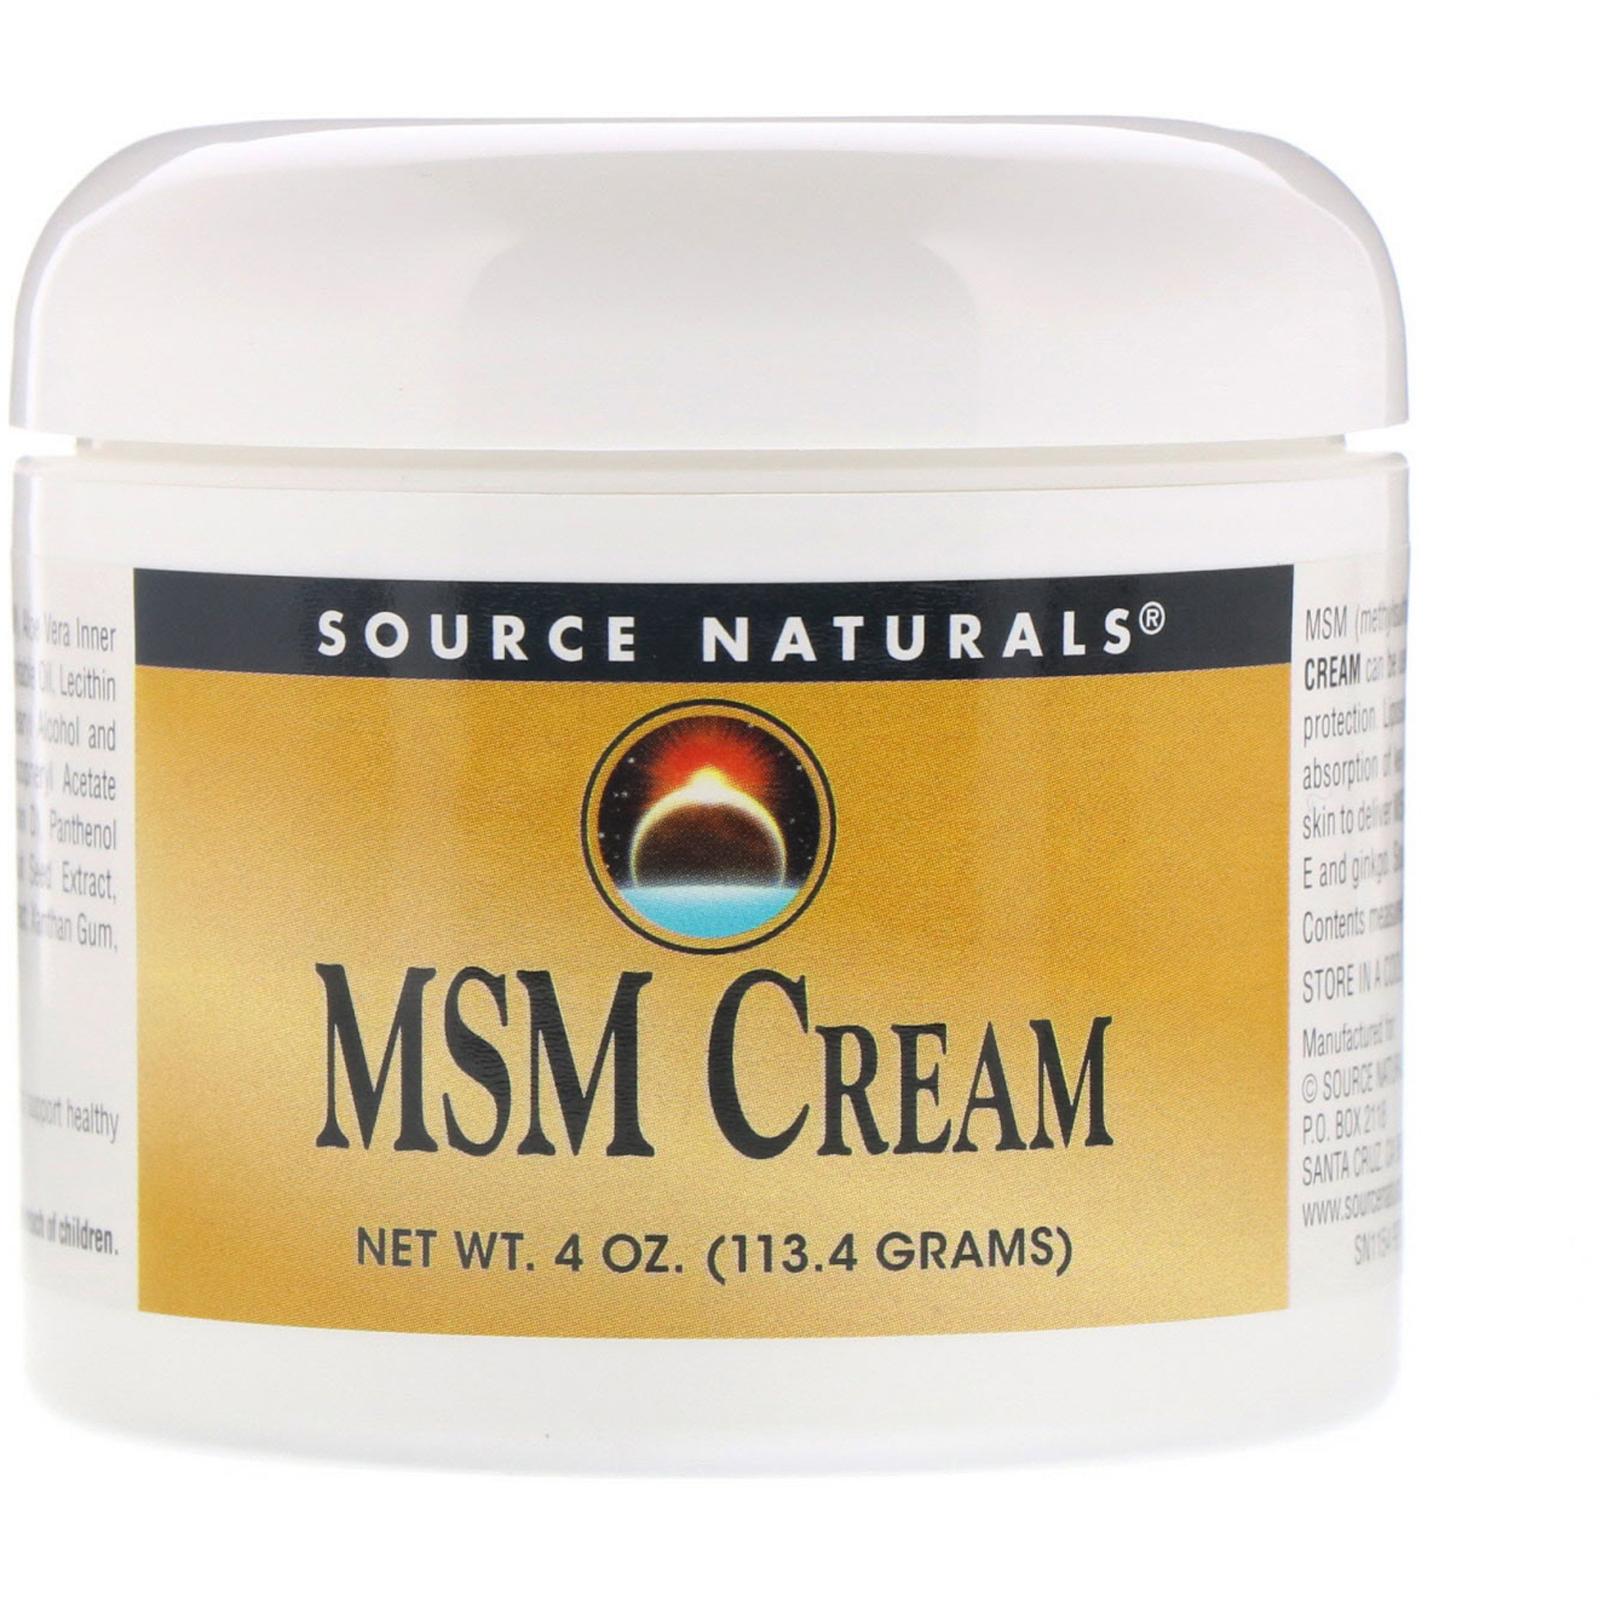 Source Naturals, MSM Cream, 4 oz (113 4 g) - iHerb com